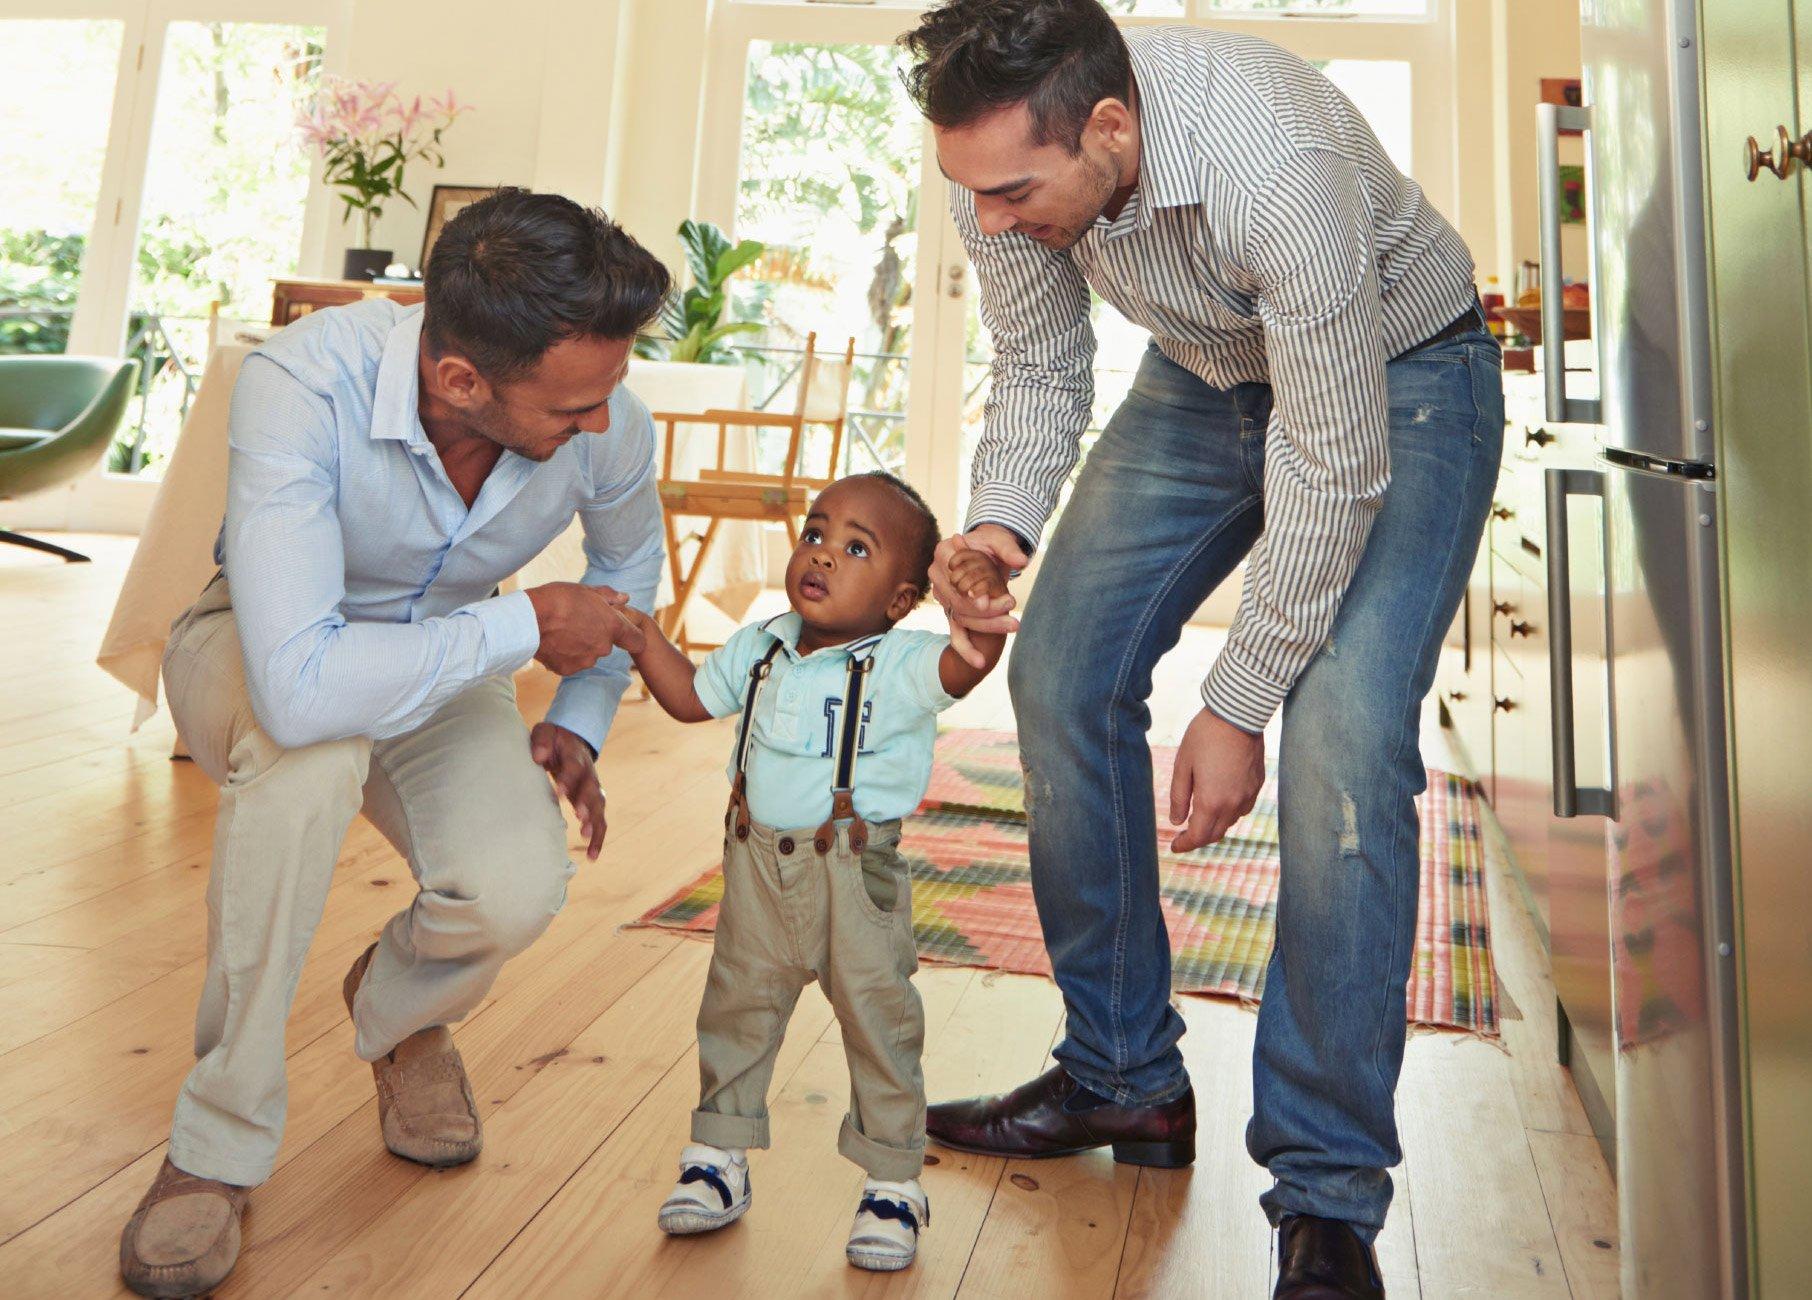 Gay Surrogacy & Adoption Ethics